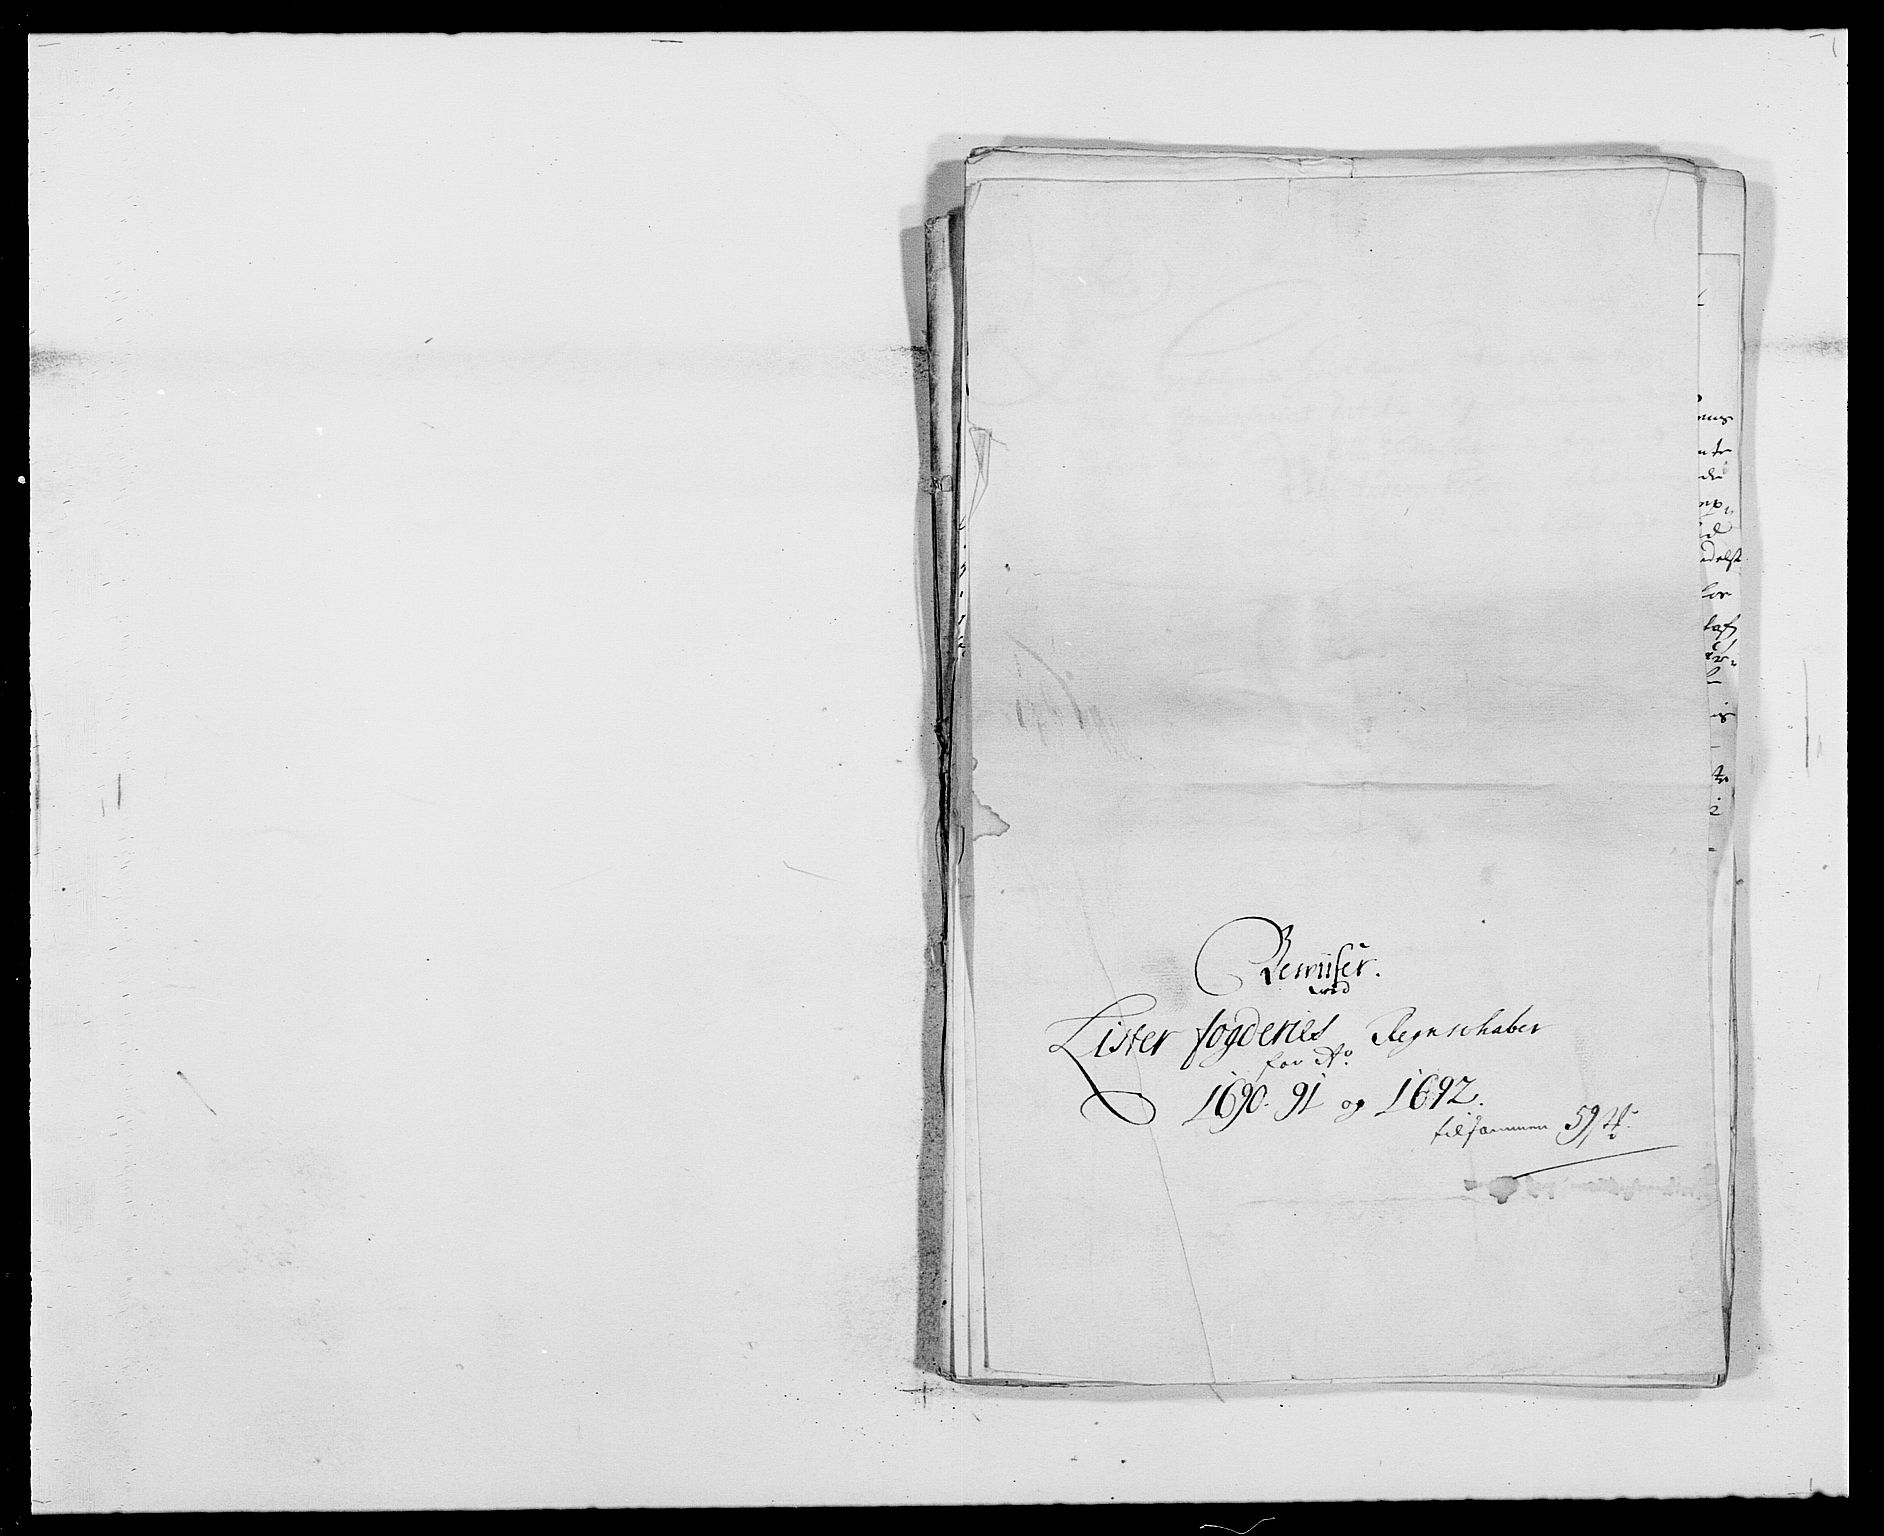 RA, Rentekammeret inntil 1814, Reviderte regnskaper, Fogderegnskap, R41/L2536: Fogderegnskap Lista, 1690-1693, s. 64